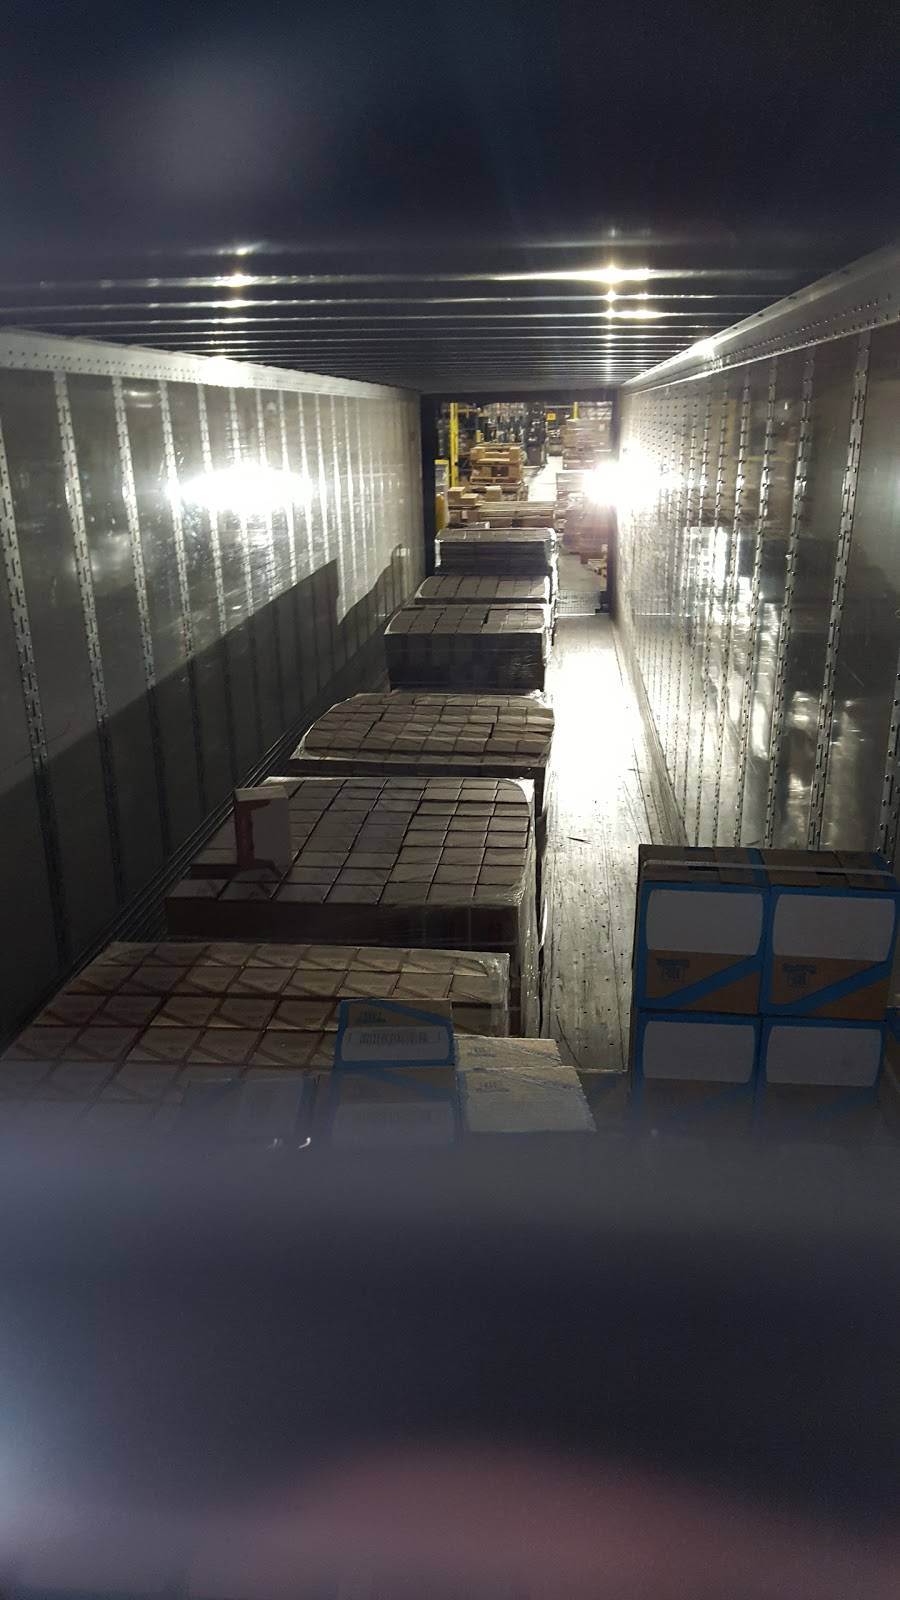 Windigo Logistics - storage    Photo 3 of 9   Address: 11025 Charter Oak Ranch Rd, Fountain, CO 80817, USA   Phone: (719) 382-1800